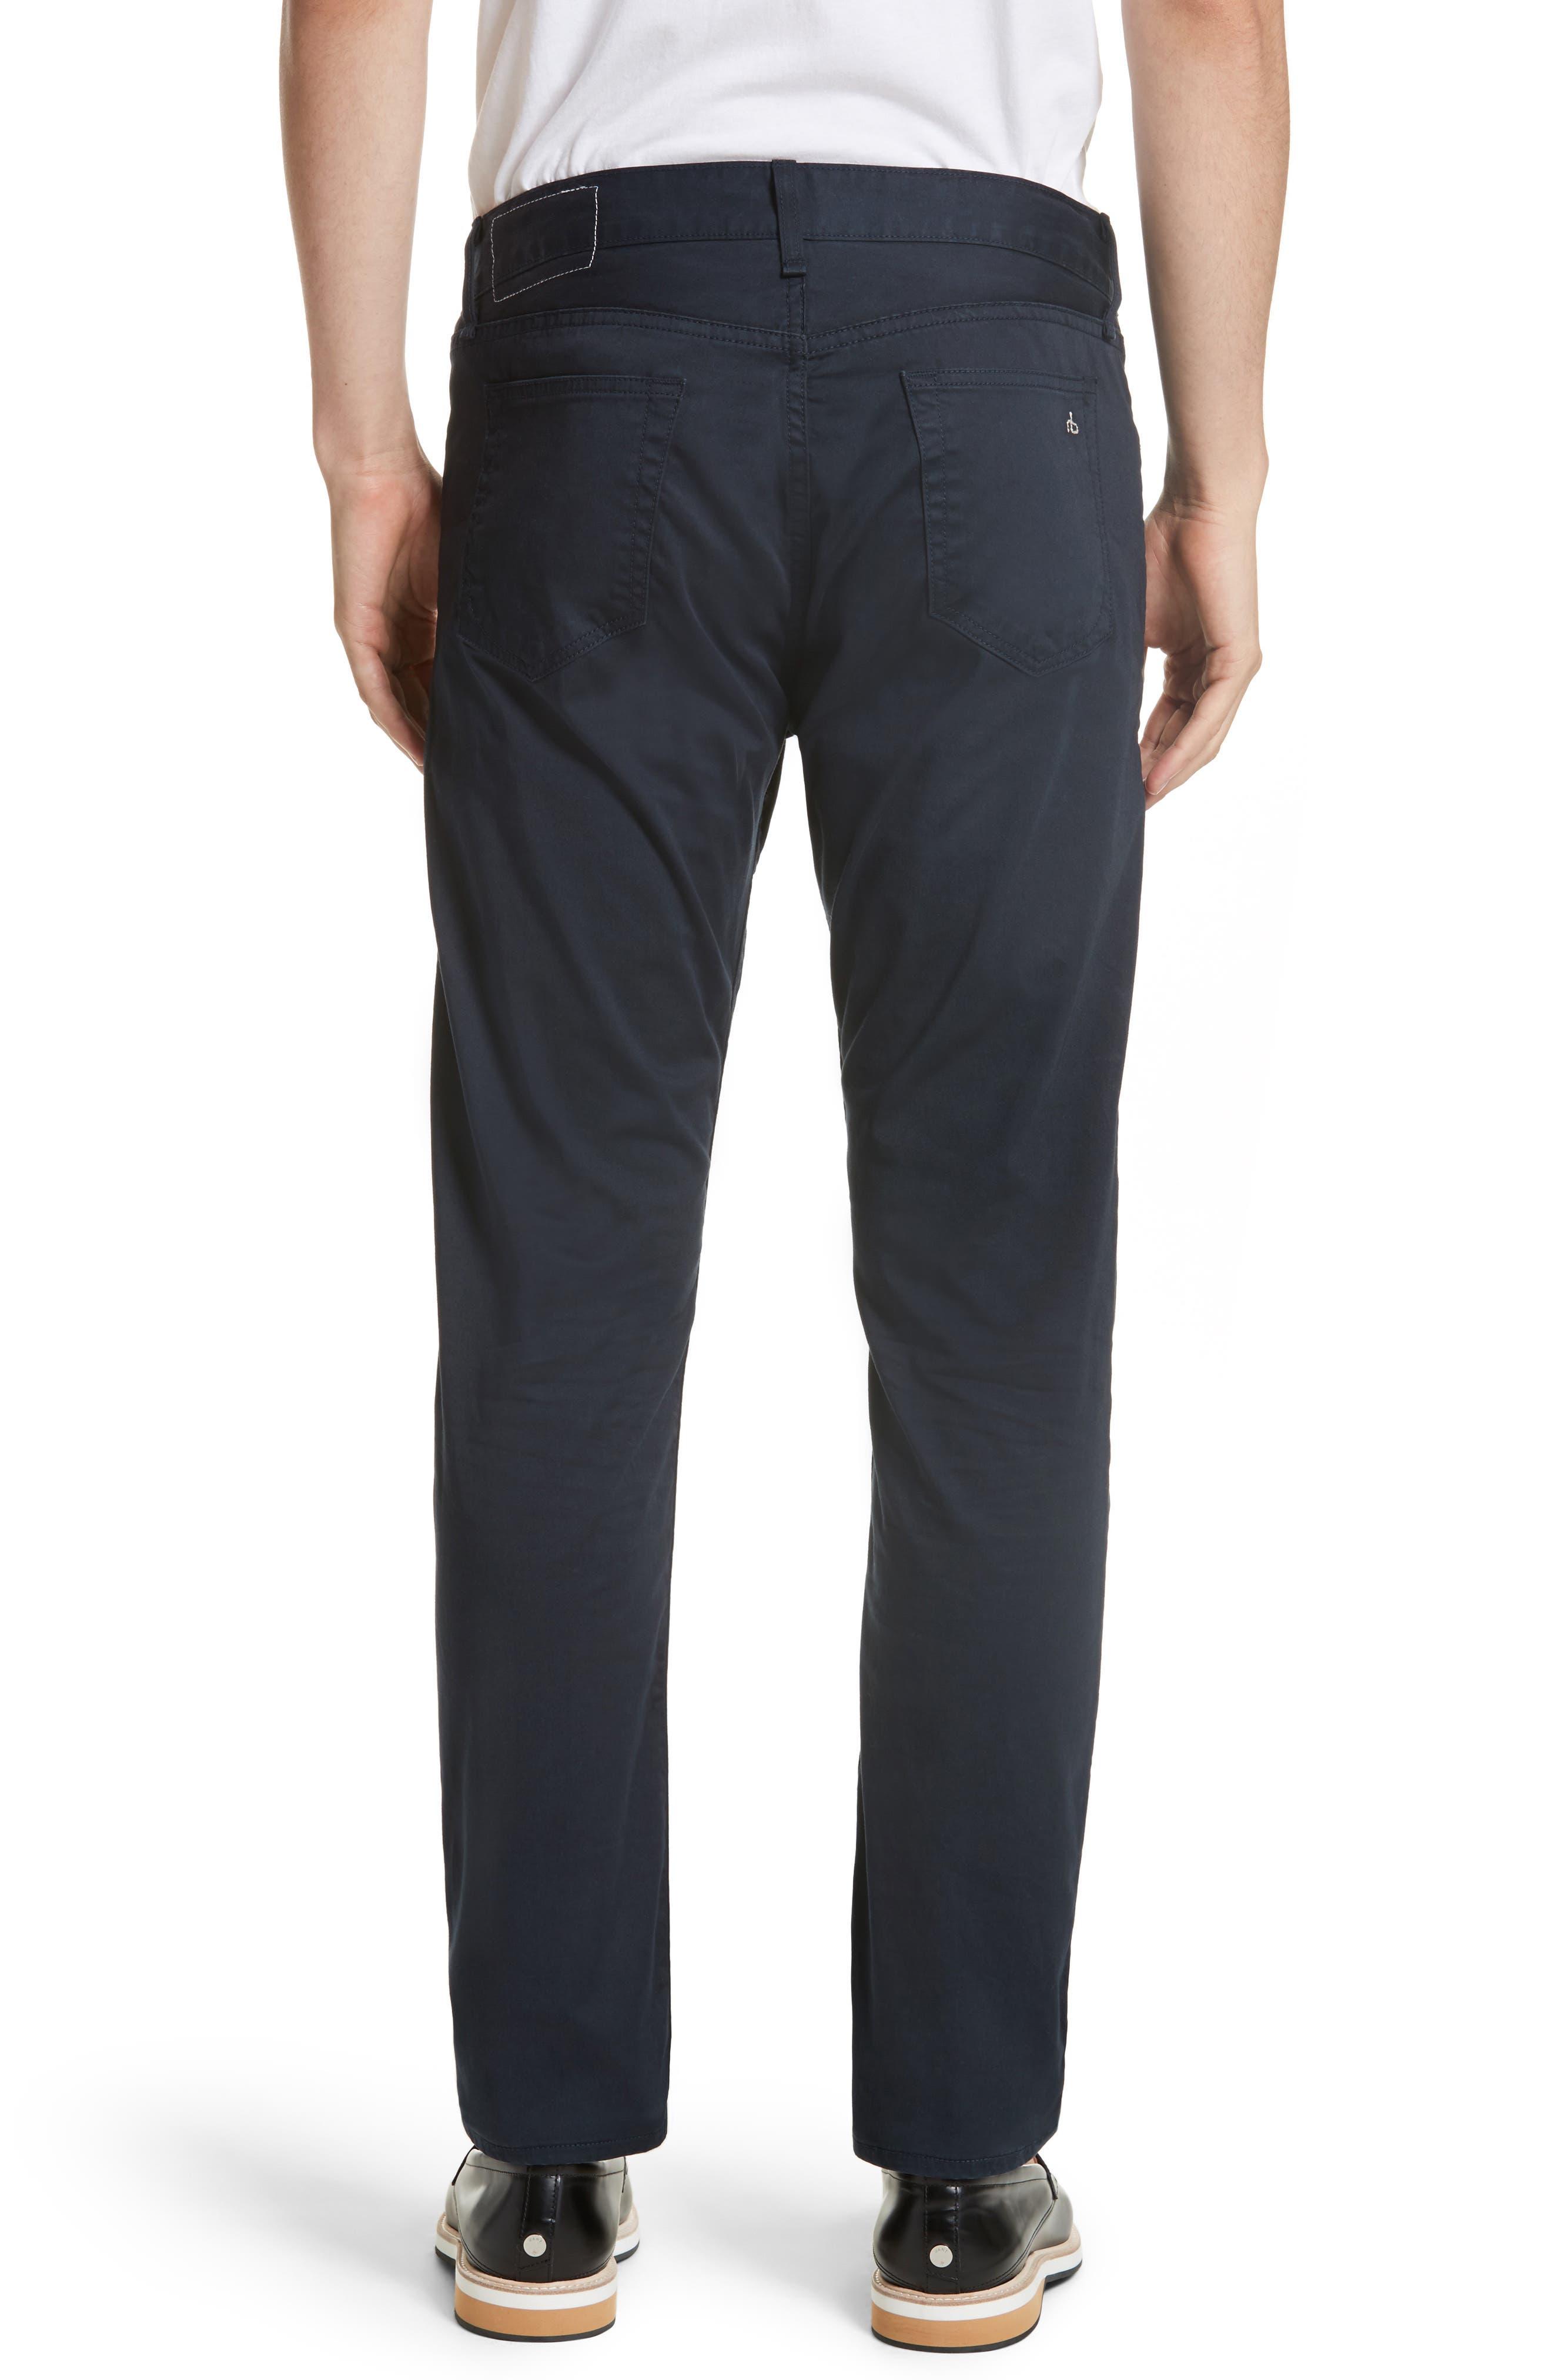 Fit 2 Five-Pocket Twill Pants,                             Alternate thumbnail 2, color,                             410